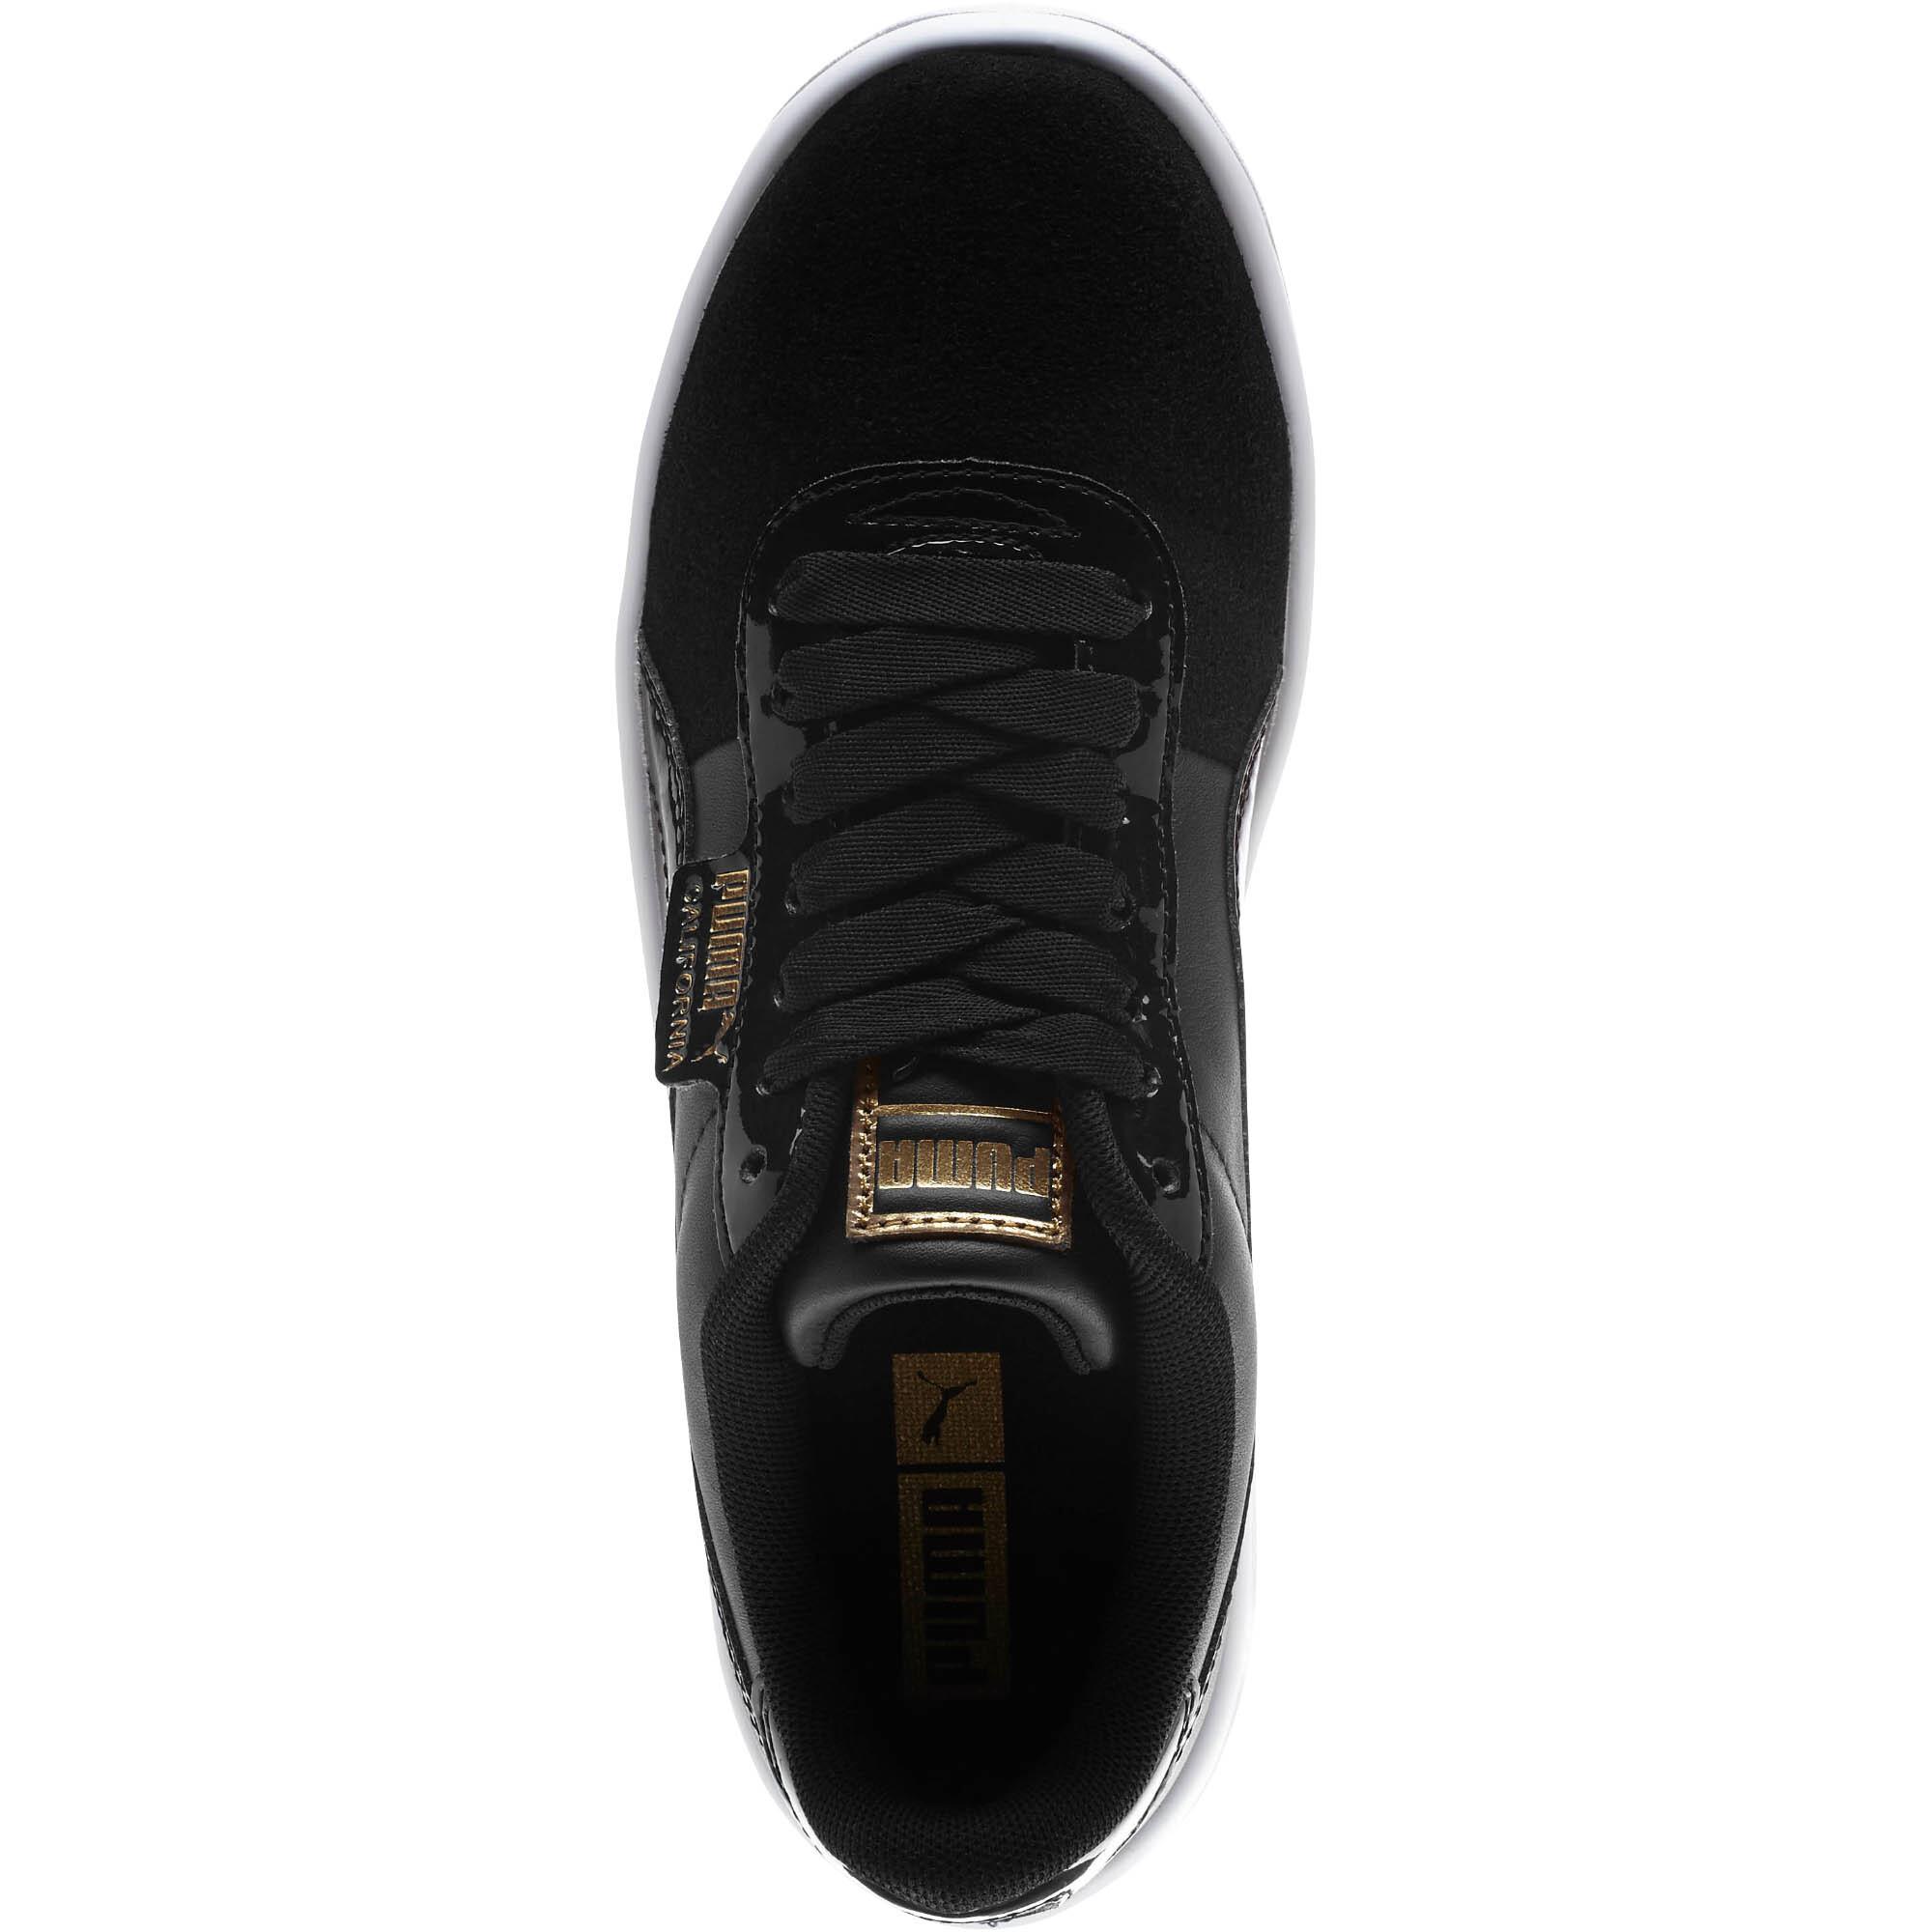 PUMA-Women-039-s-California-Monochrome-Sneakers thumbnail 6